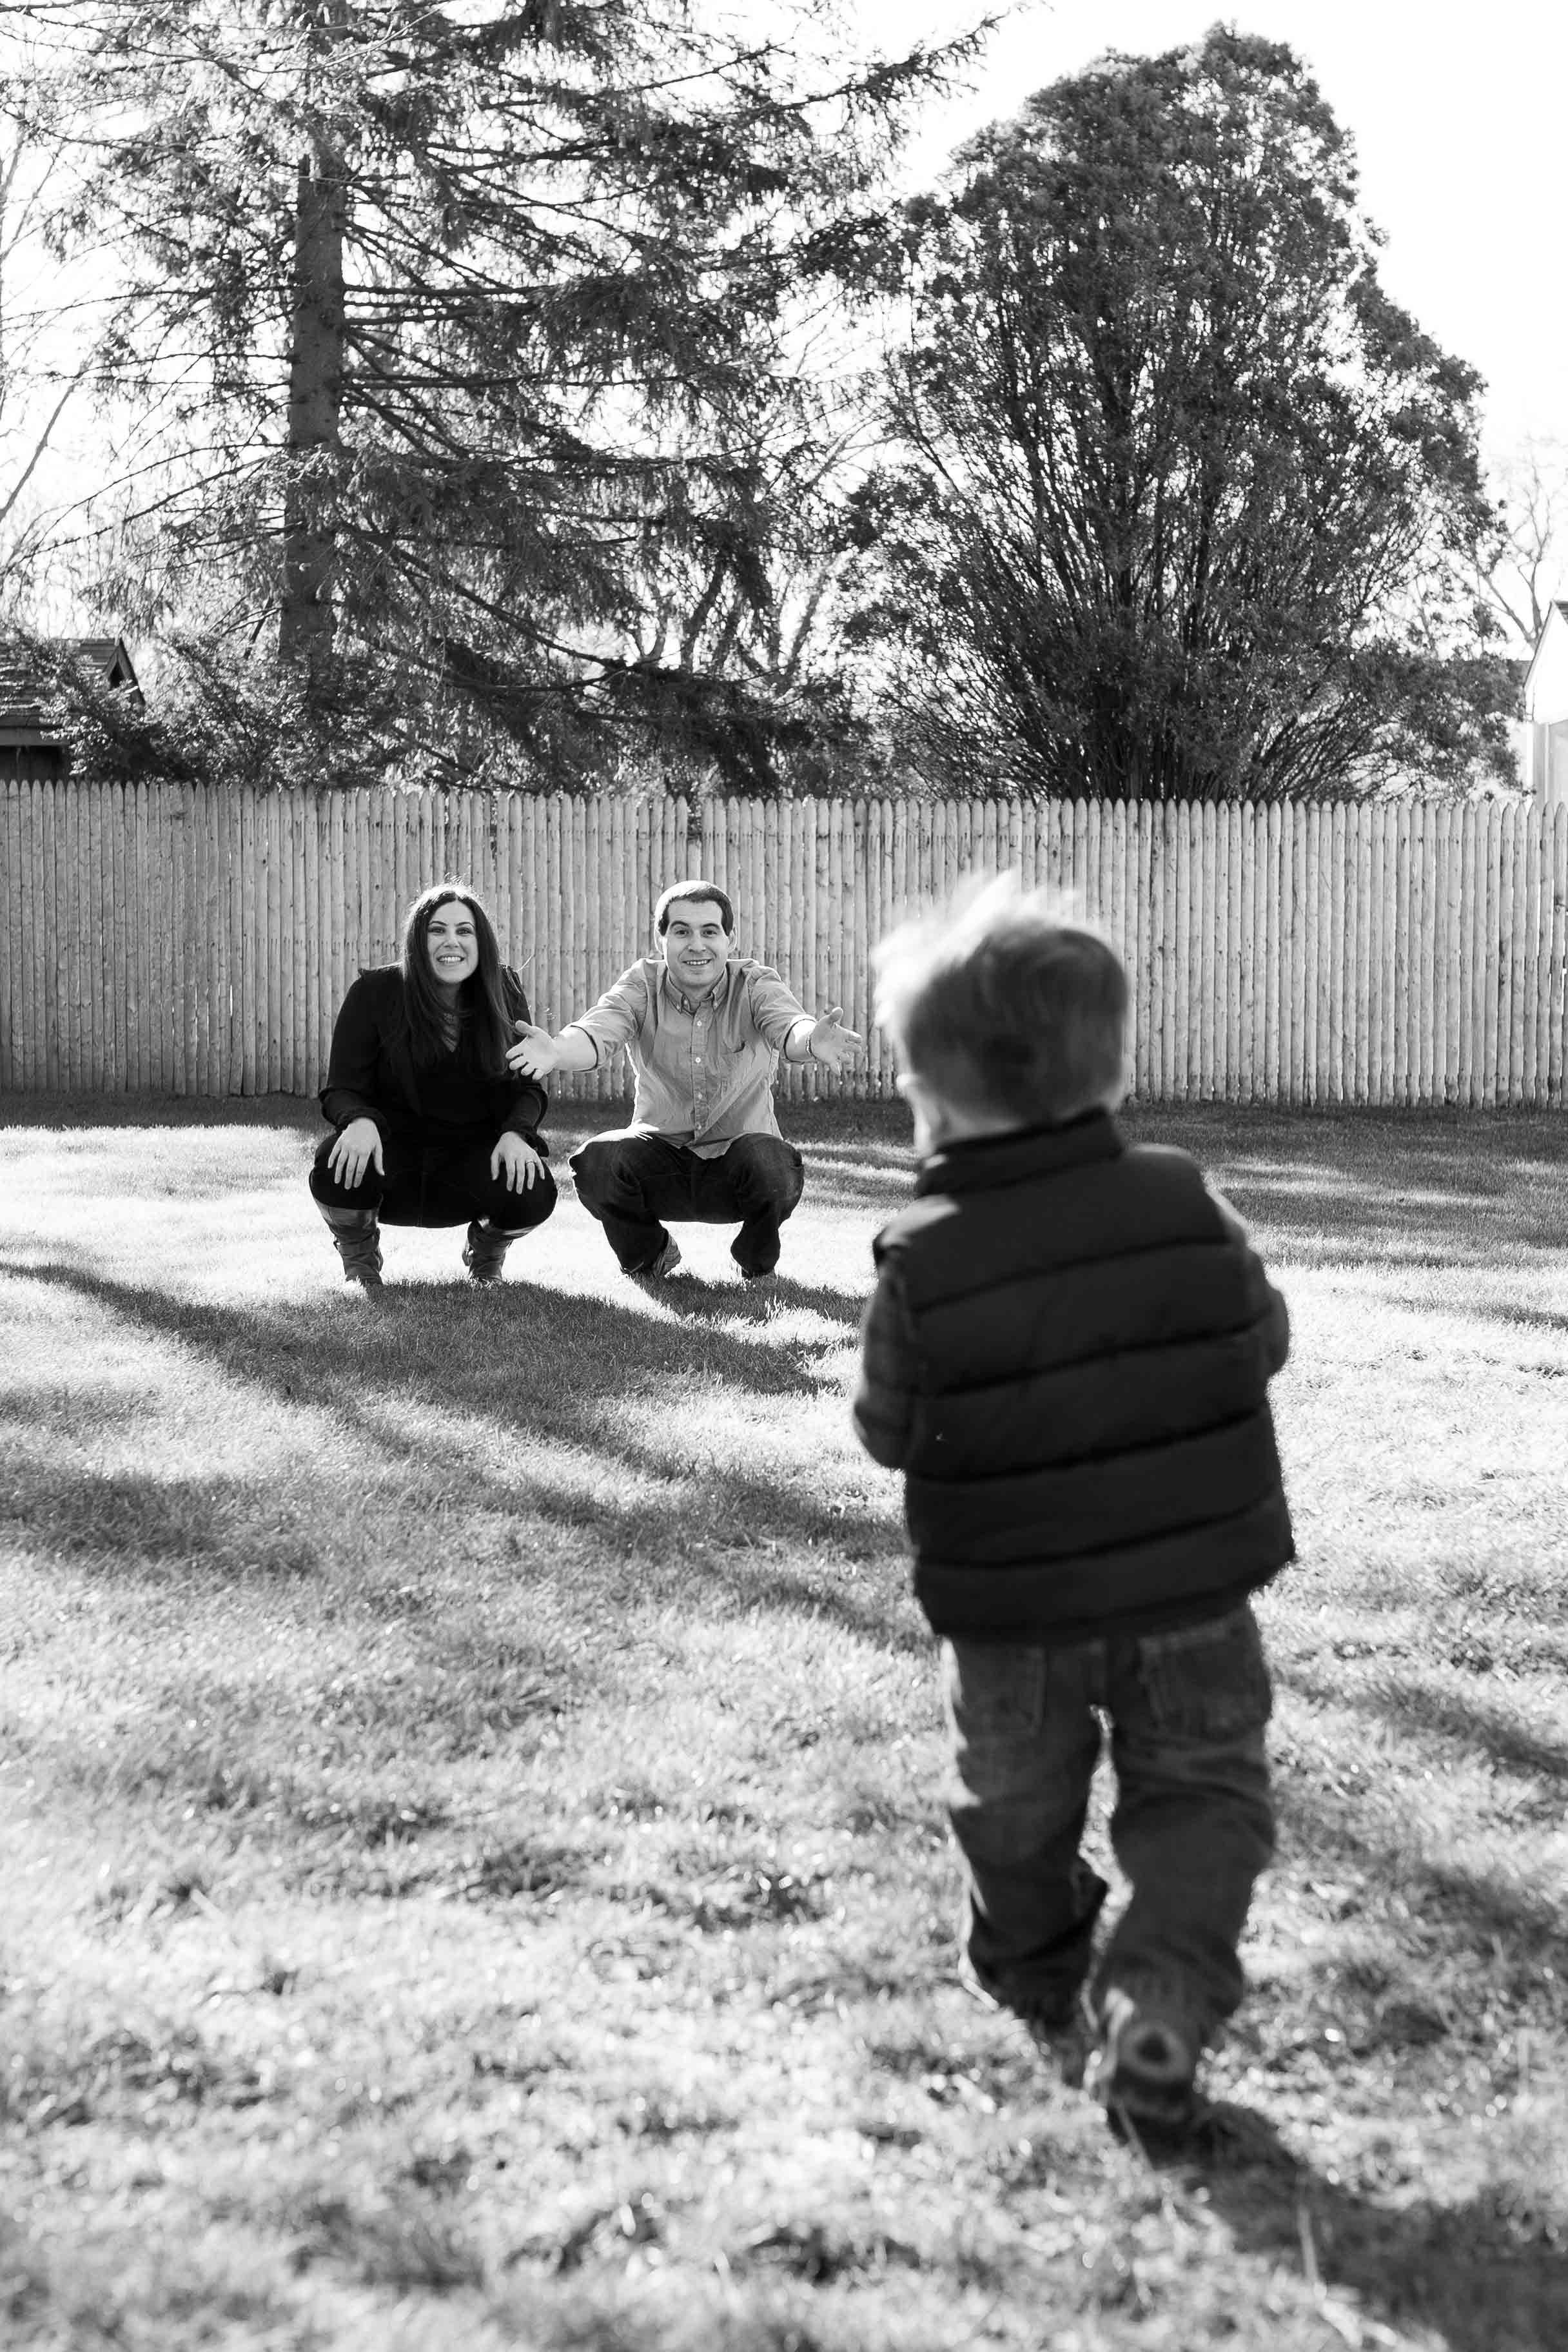 Family Photographer | Erika Kao Photography